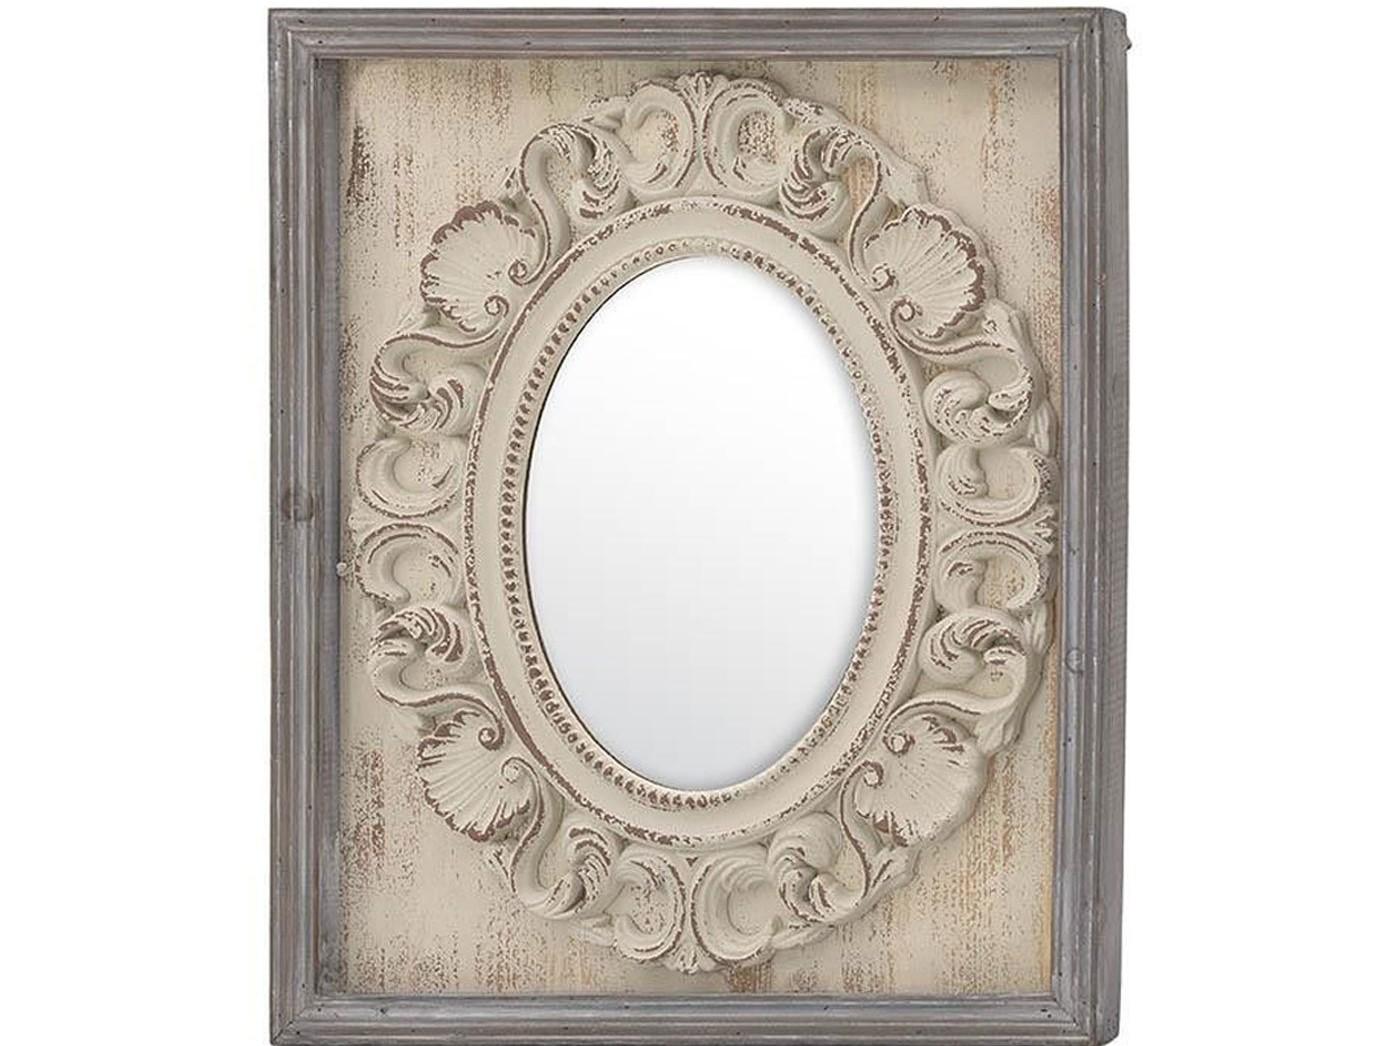 Купить Зеркало настенное Brenvio , To4rooms